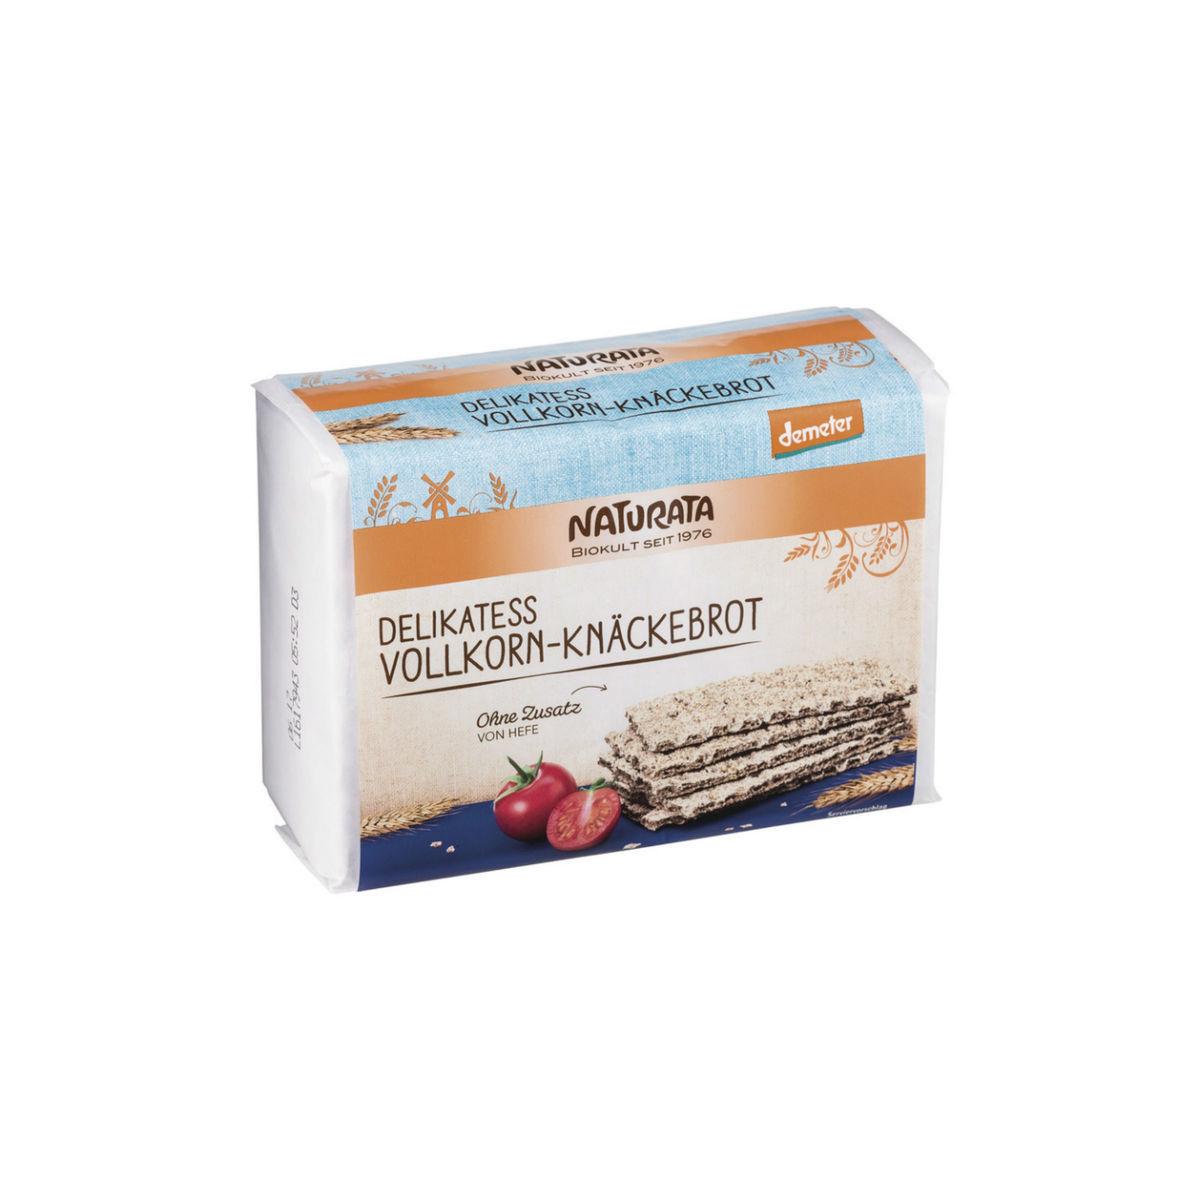 Knäckebrot Vollkorn Delikatess Pack 250 g - Naturata